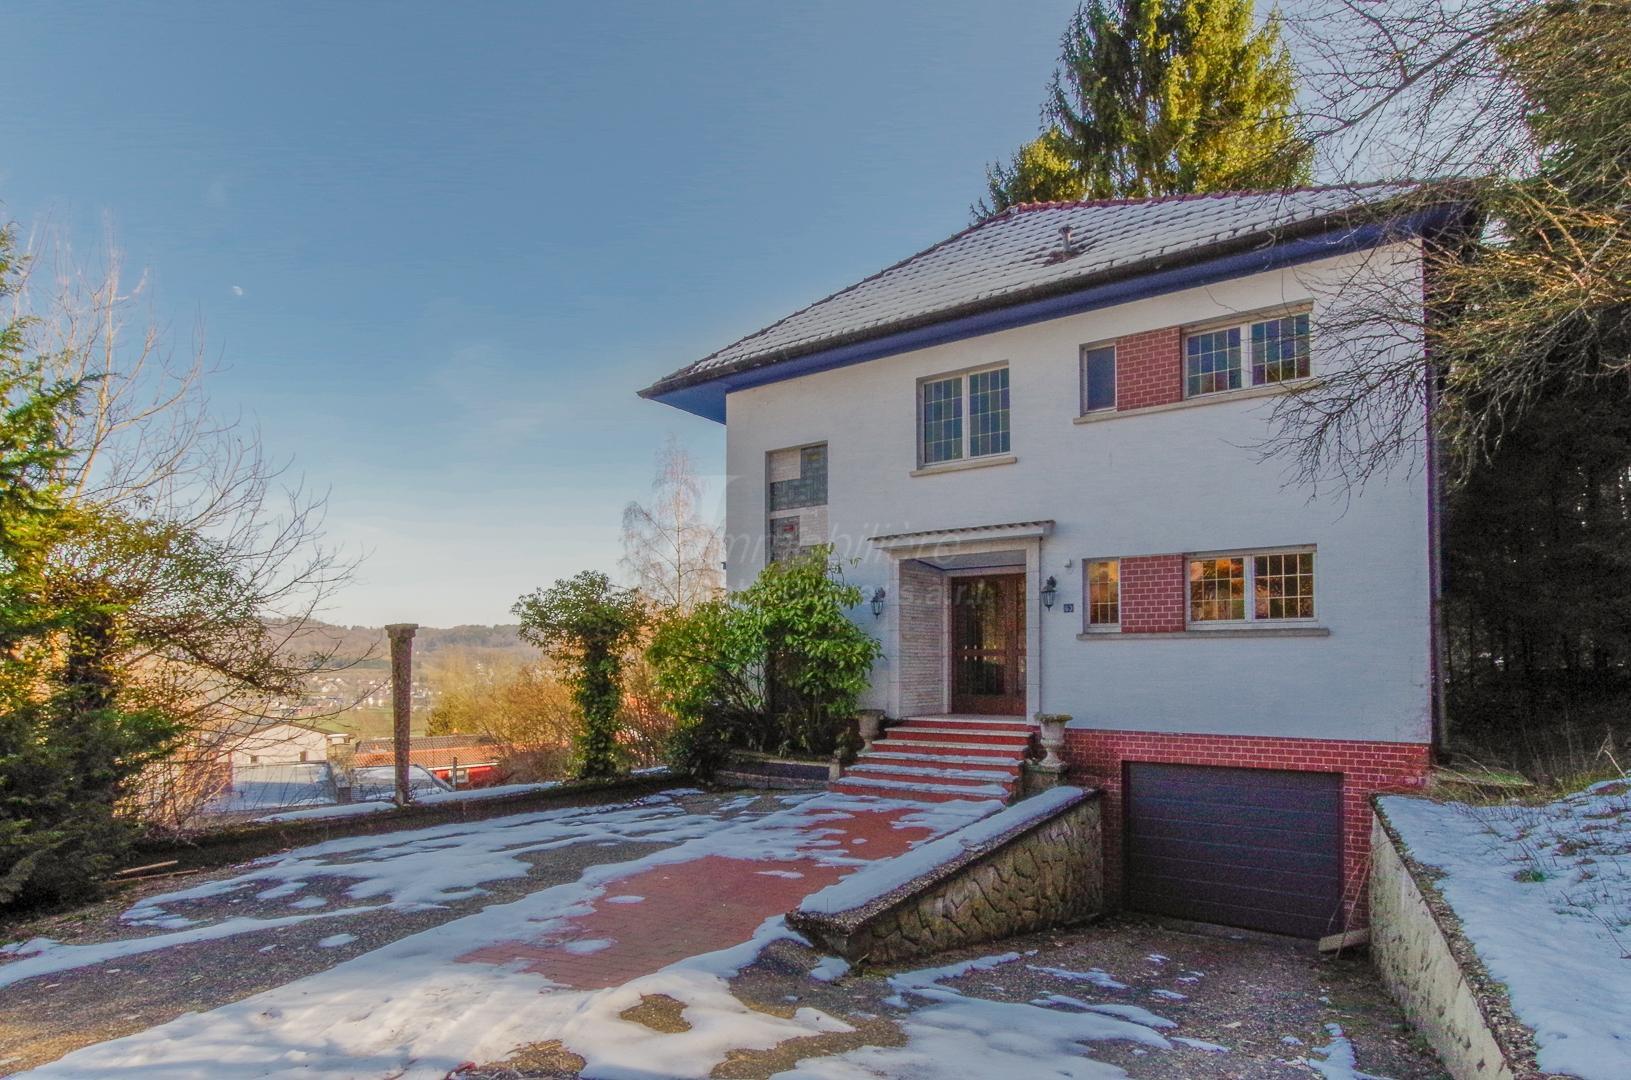 Maison individuelle - 17823 - 73800000 € - Steinsel